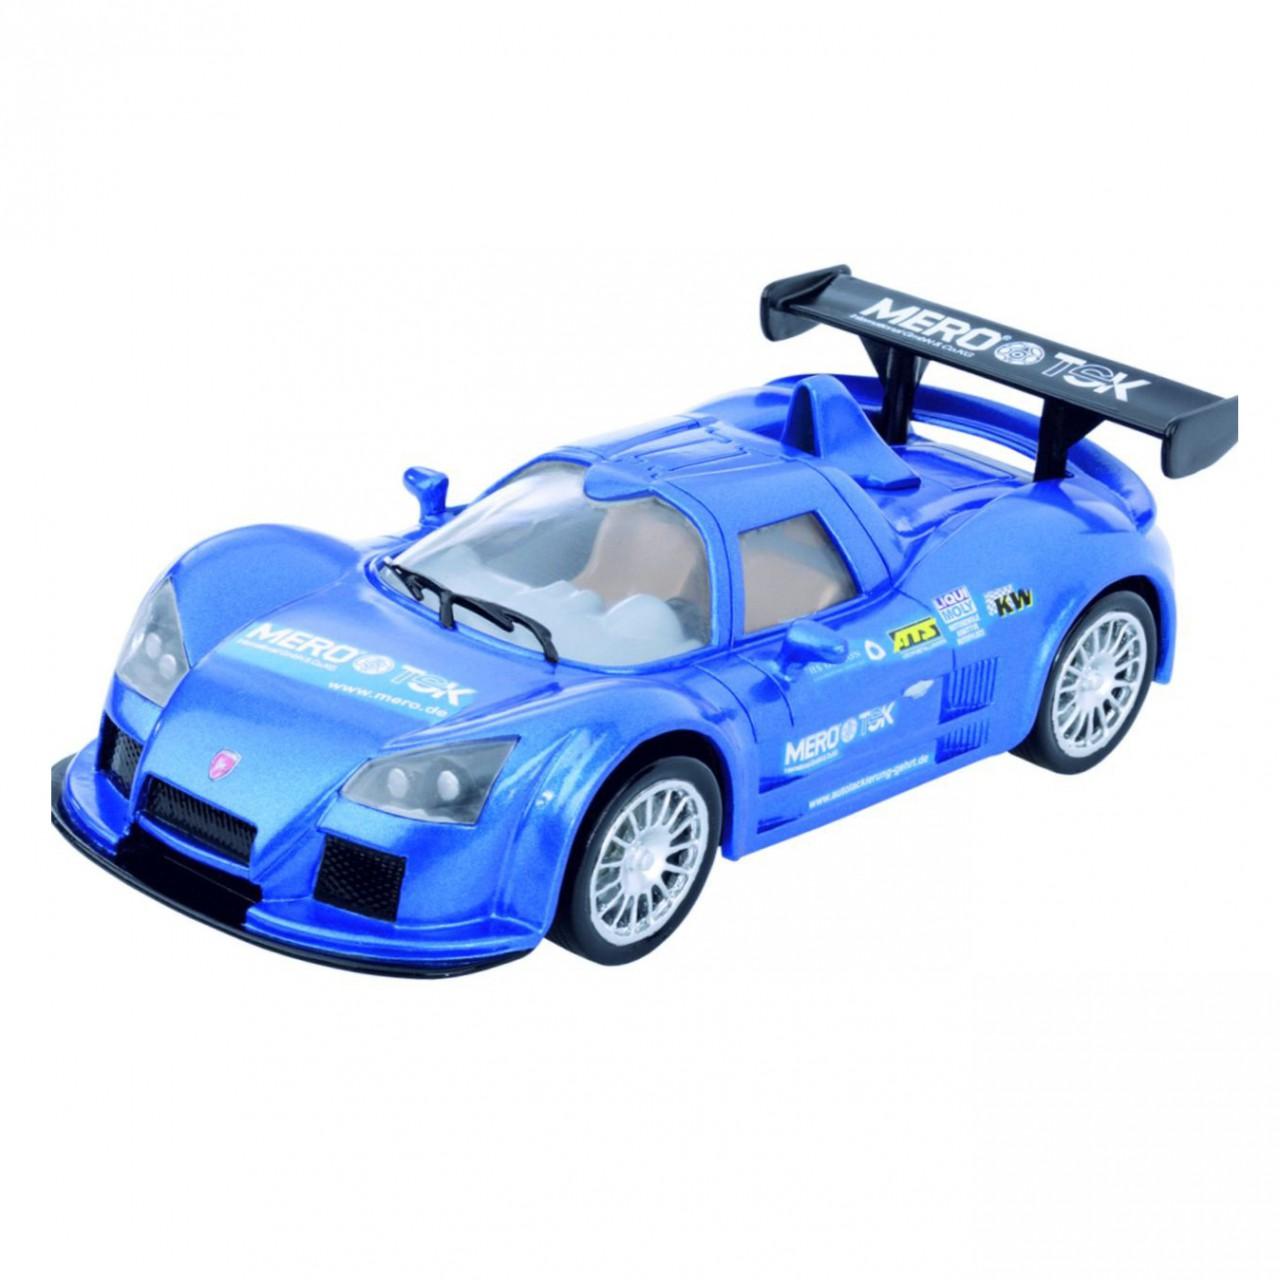 Cartronic R/C Car Apollo Gumpert Blau 1:24 | eBay